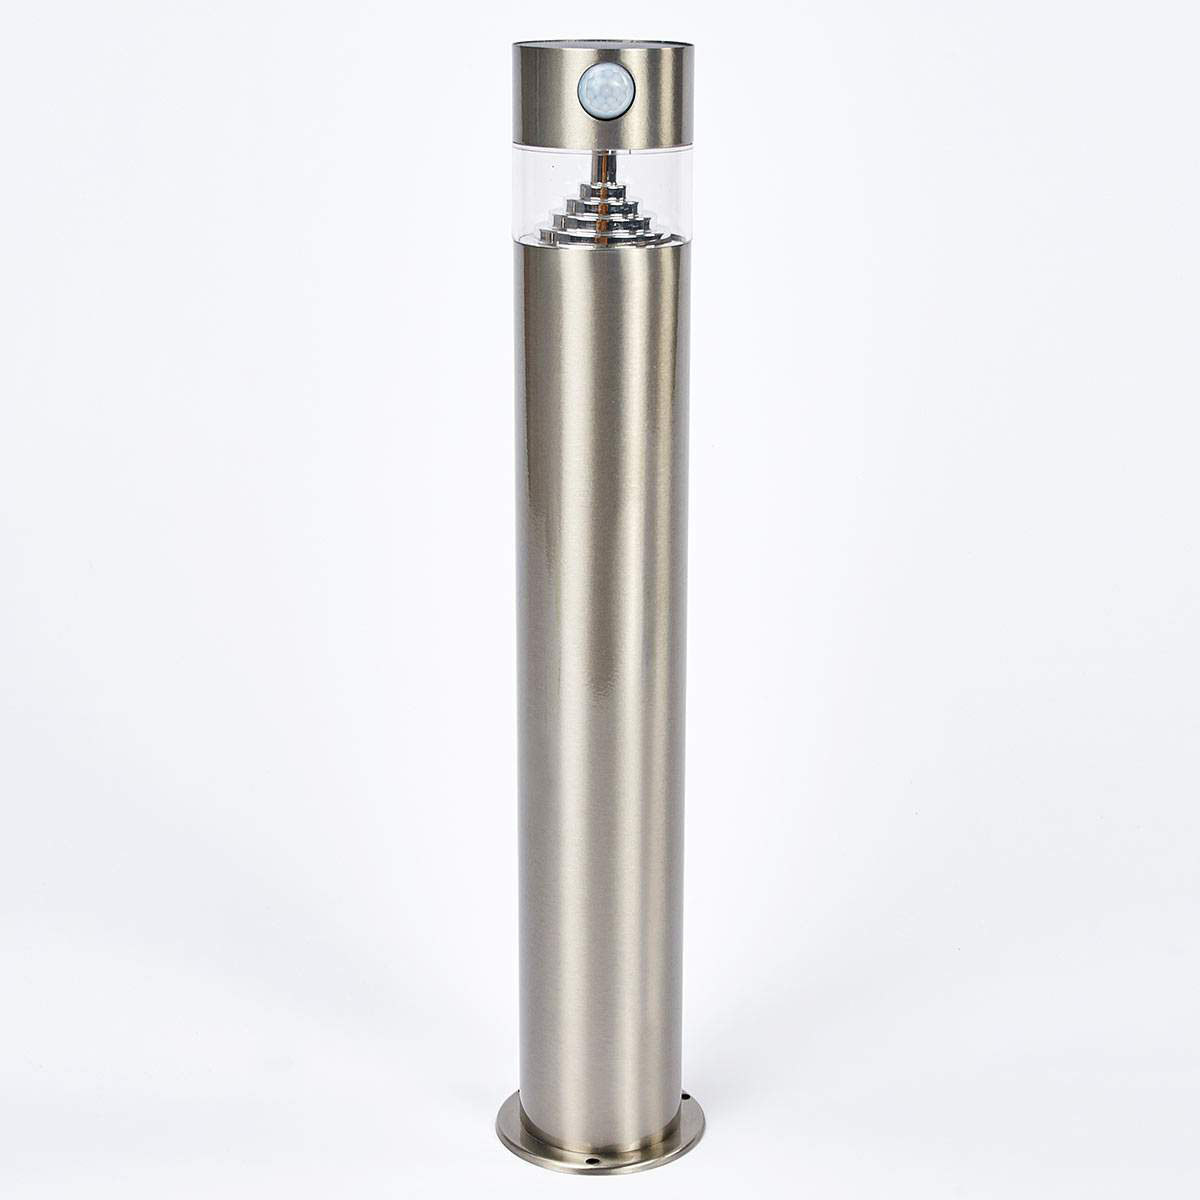 Solar-LED-Sockelleuchte Kalypso mit Bewegungsmelder, 50x7,8x7,8 cm, Edelstahl, silber | #4